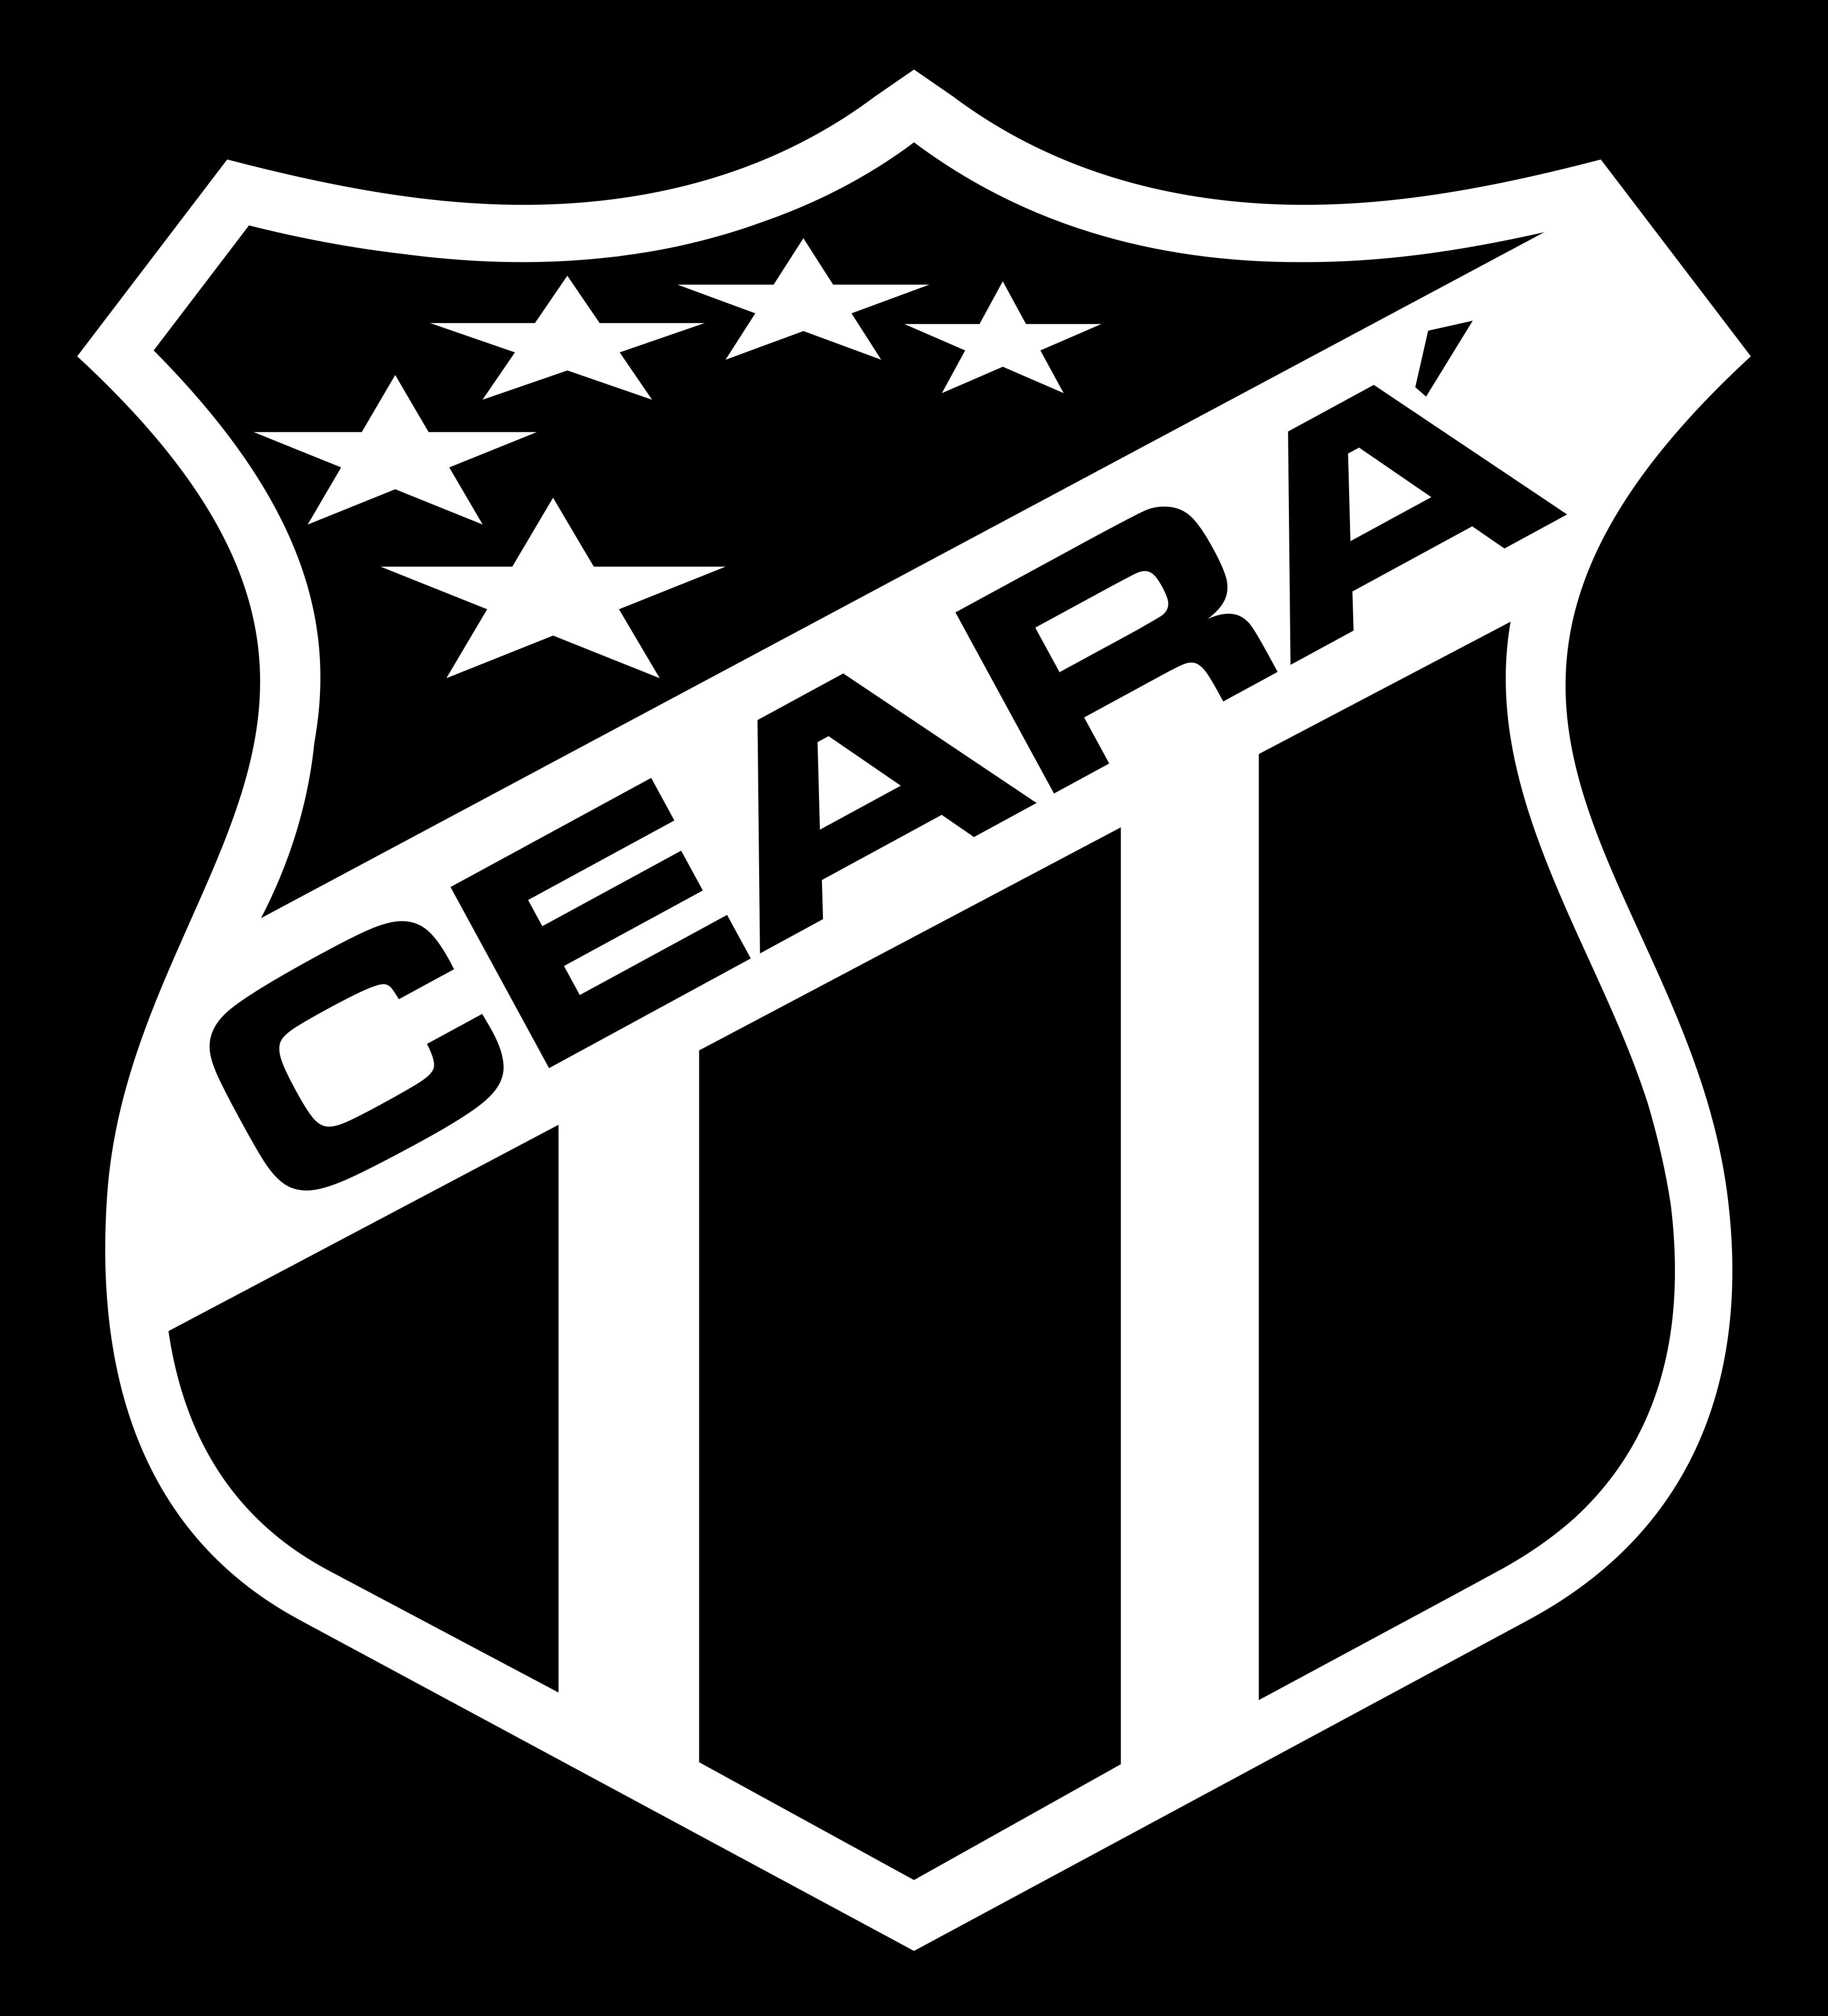 ceara logo - Ceará SC Logo